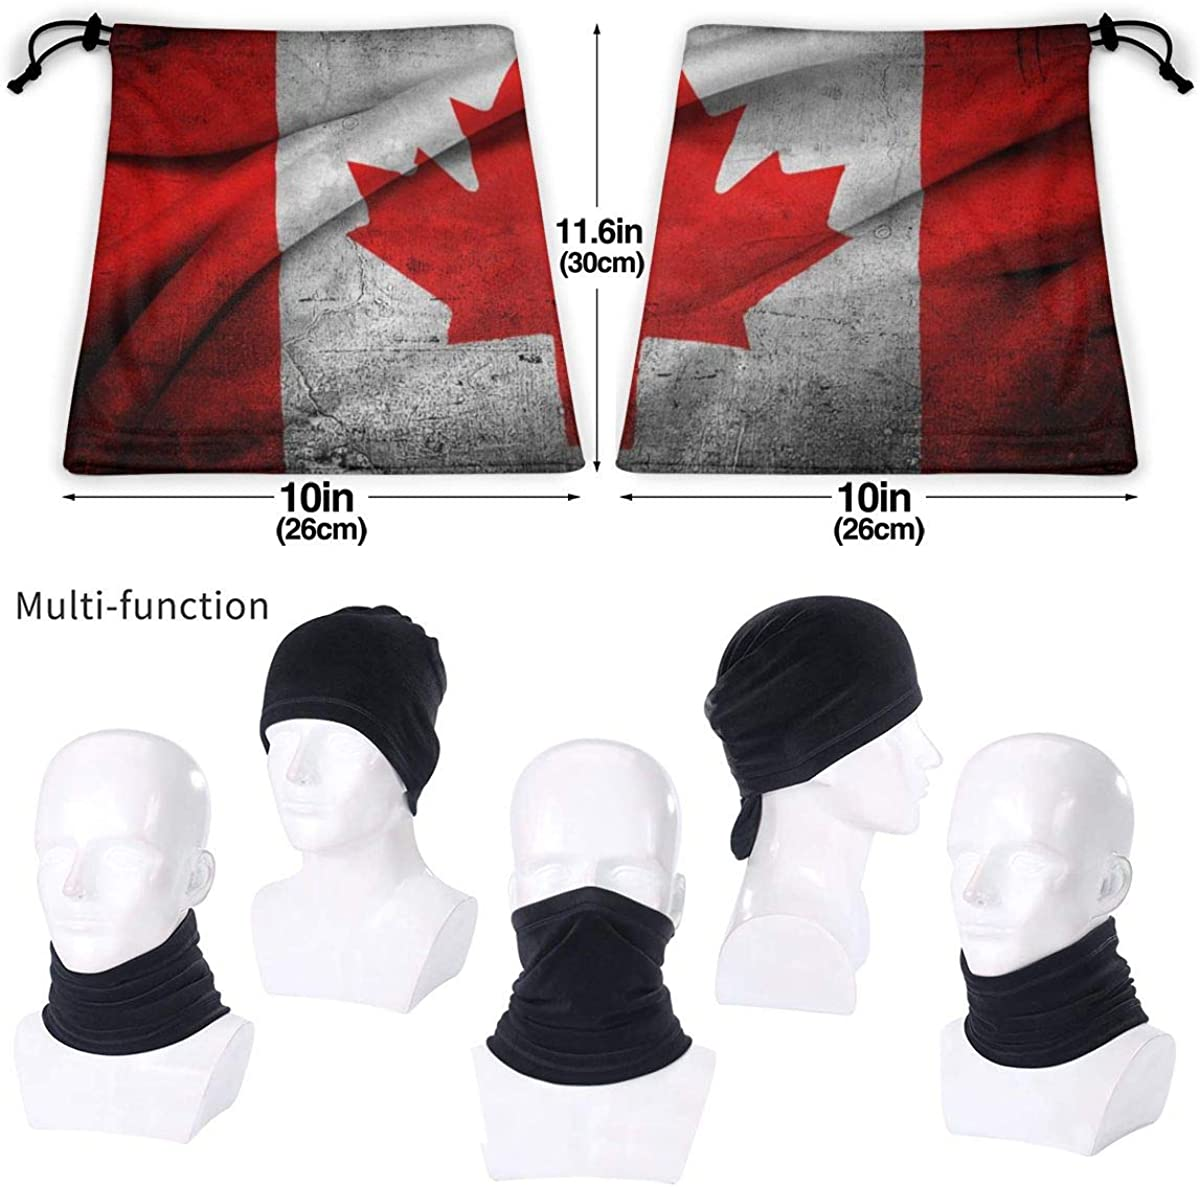 Canada Flag Wave Grunge Winter Neck Warmer Gaiter//Balaclava Ski Face Mask Cover Neck Gaiter Tube Ear Warmer Headband /& Face Mask Hats Headwear for Cold Weather Winter Outdoor Sports Black